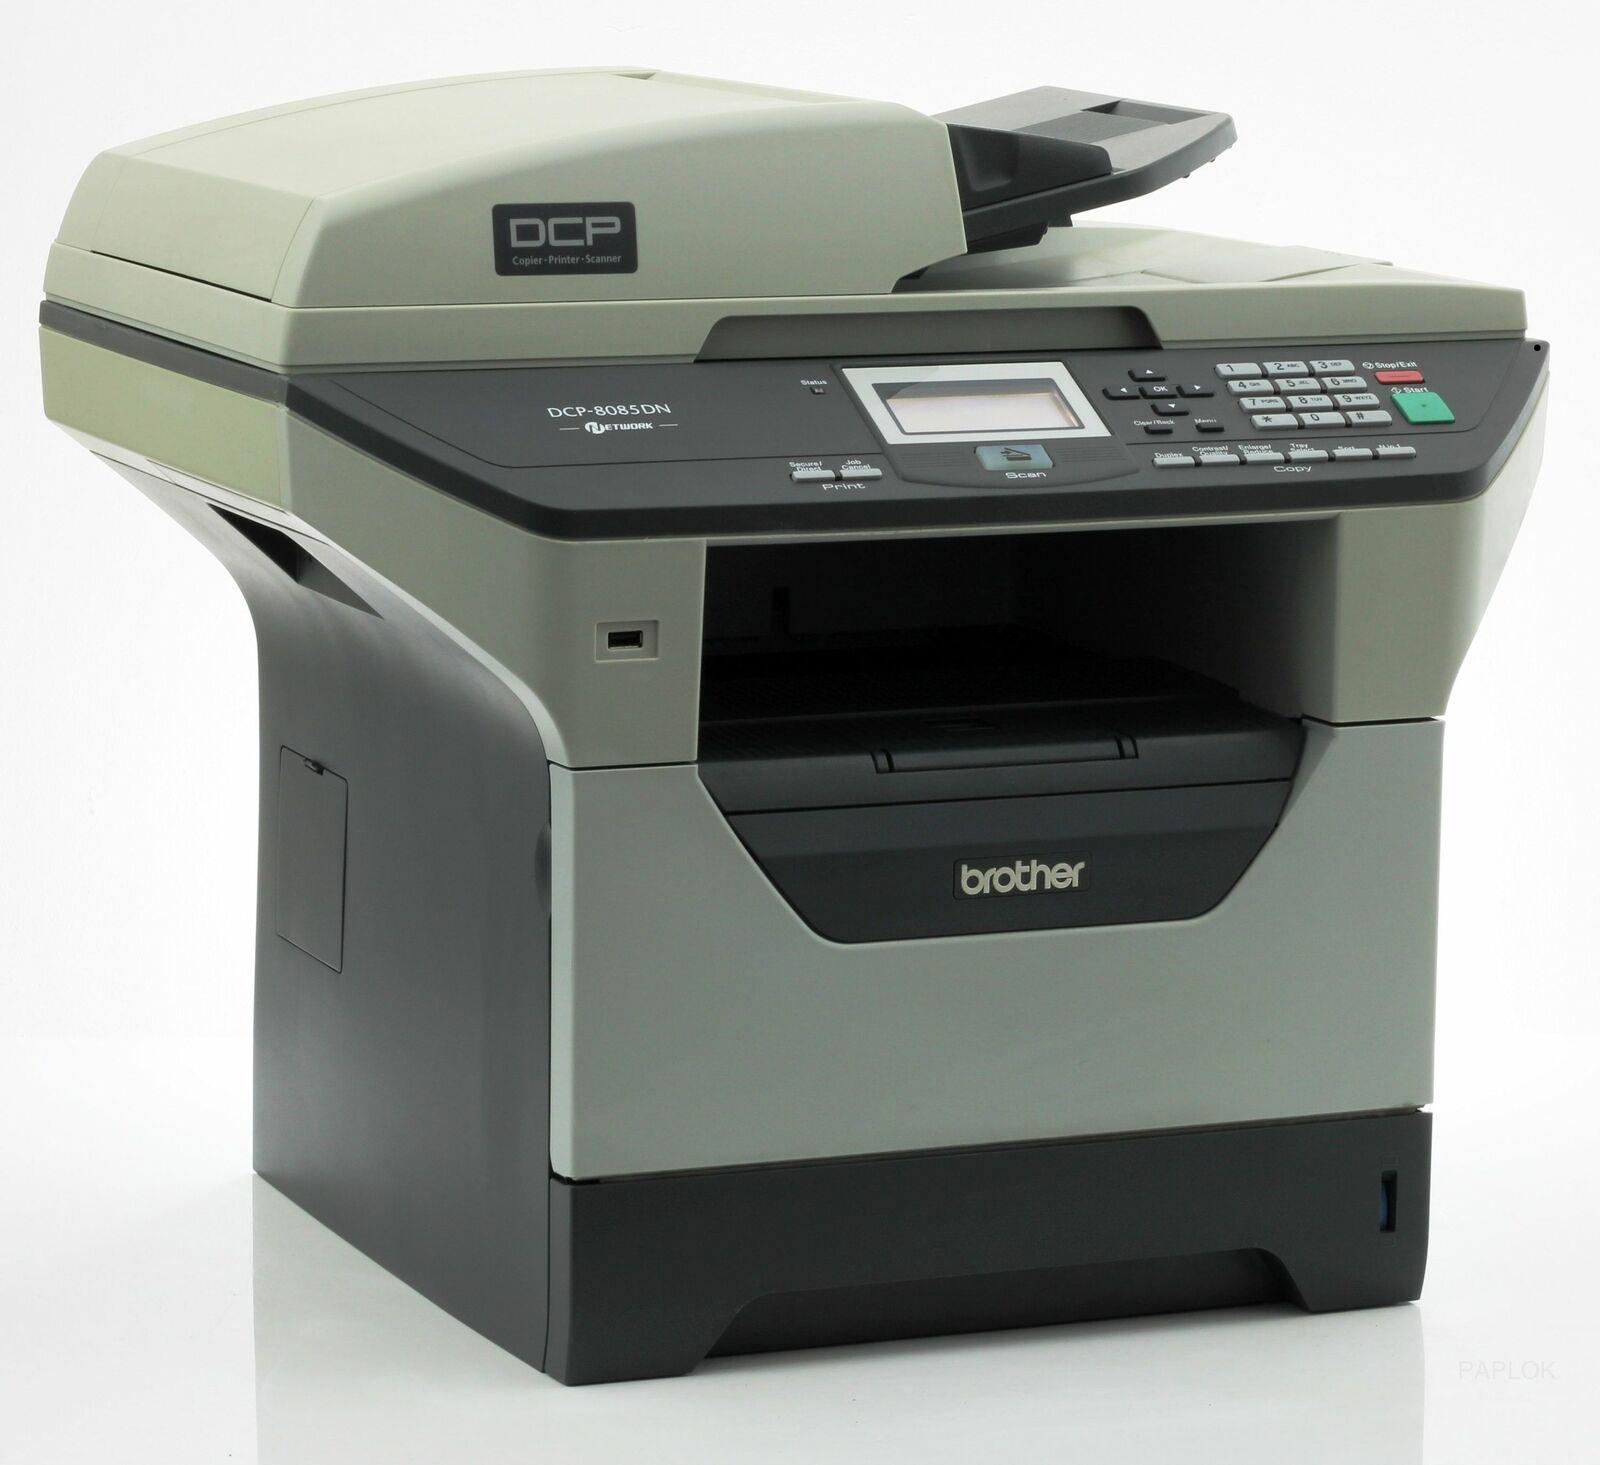 Brother imprimante mfc-8085dn multifonctions copieur laser scanneur